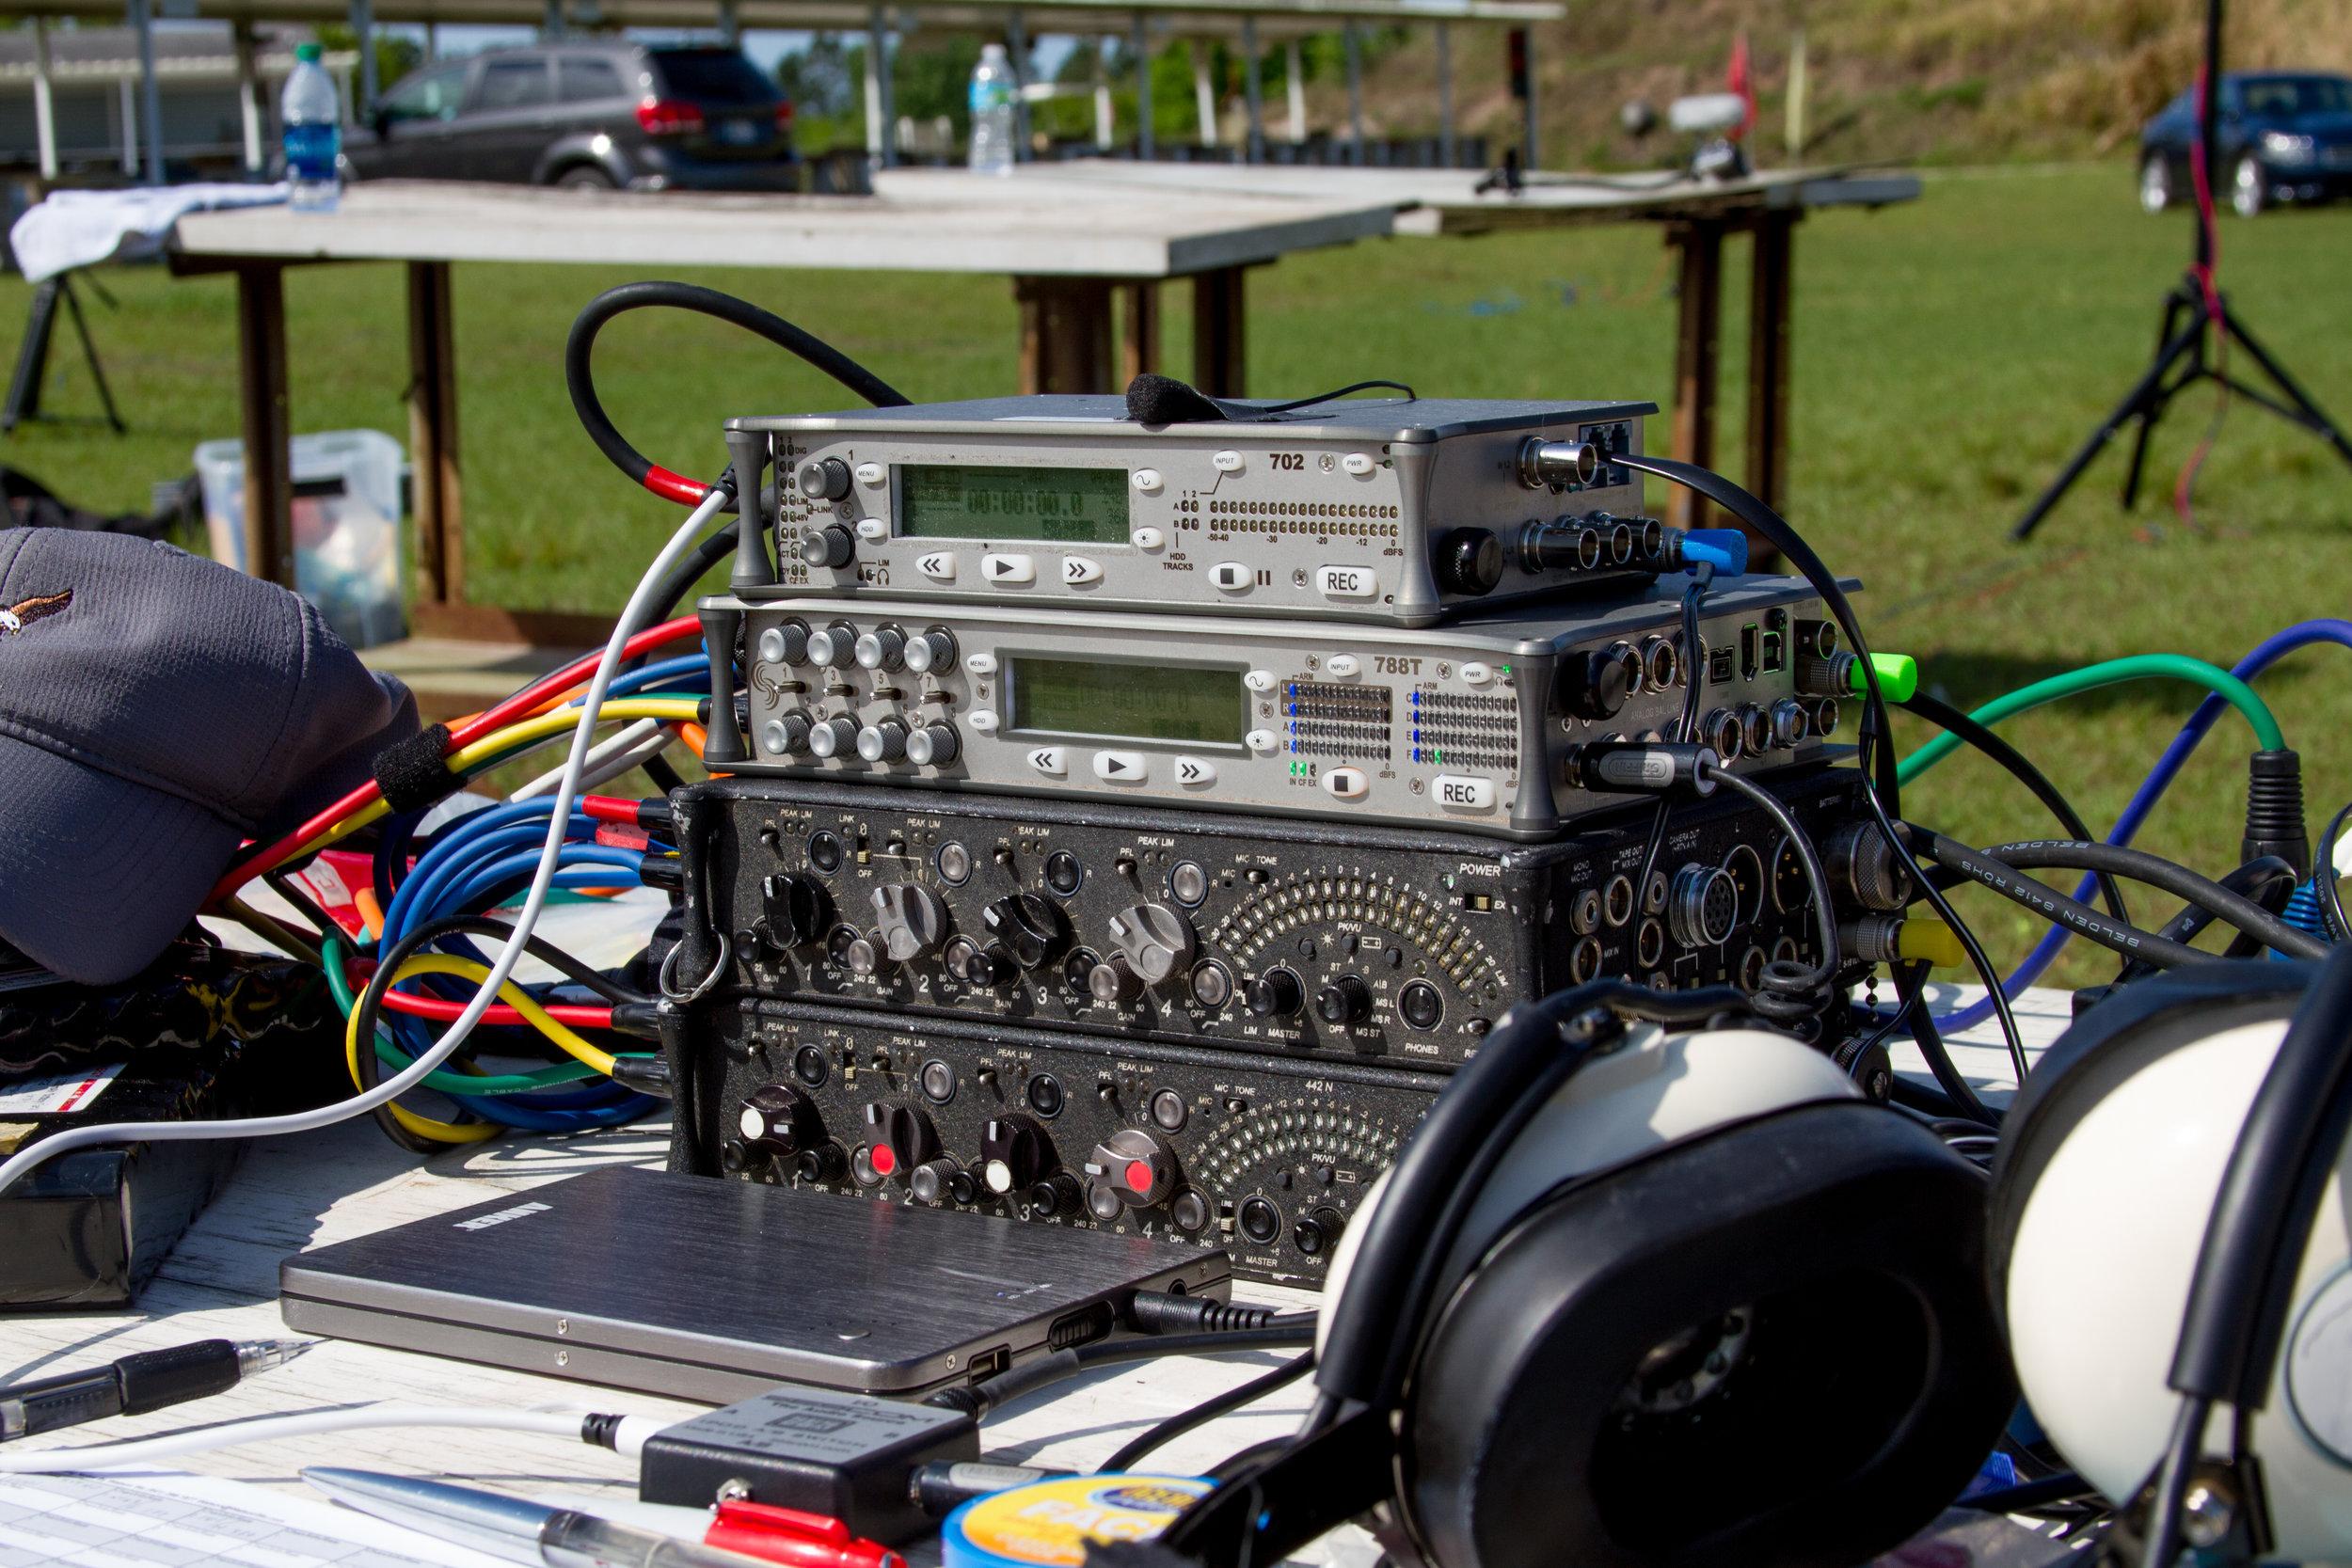 TripwireGuns2016- (8) Sound Devices recording gear.jpg